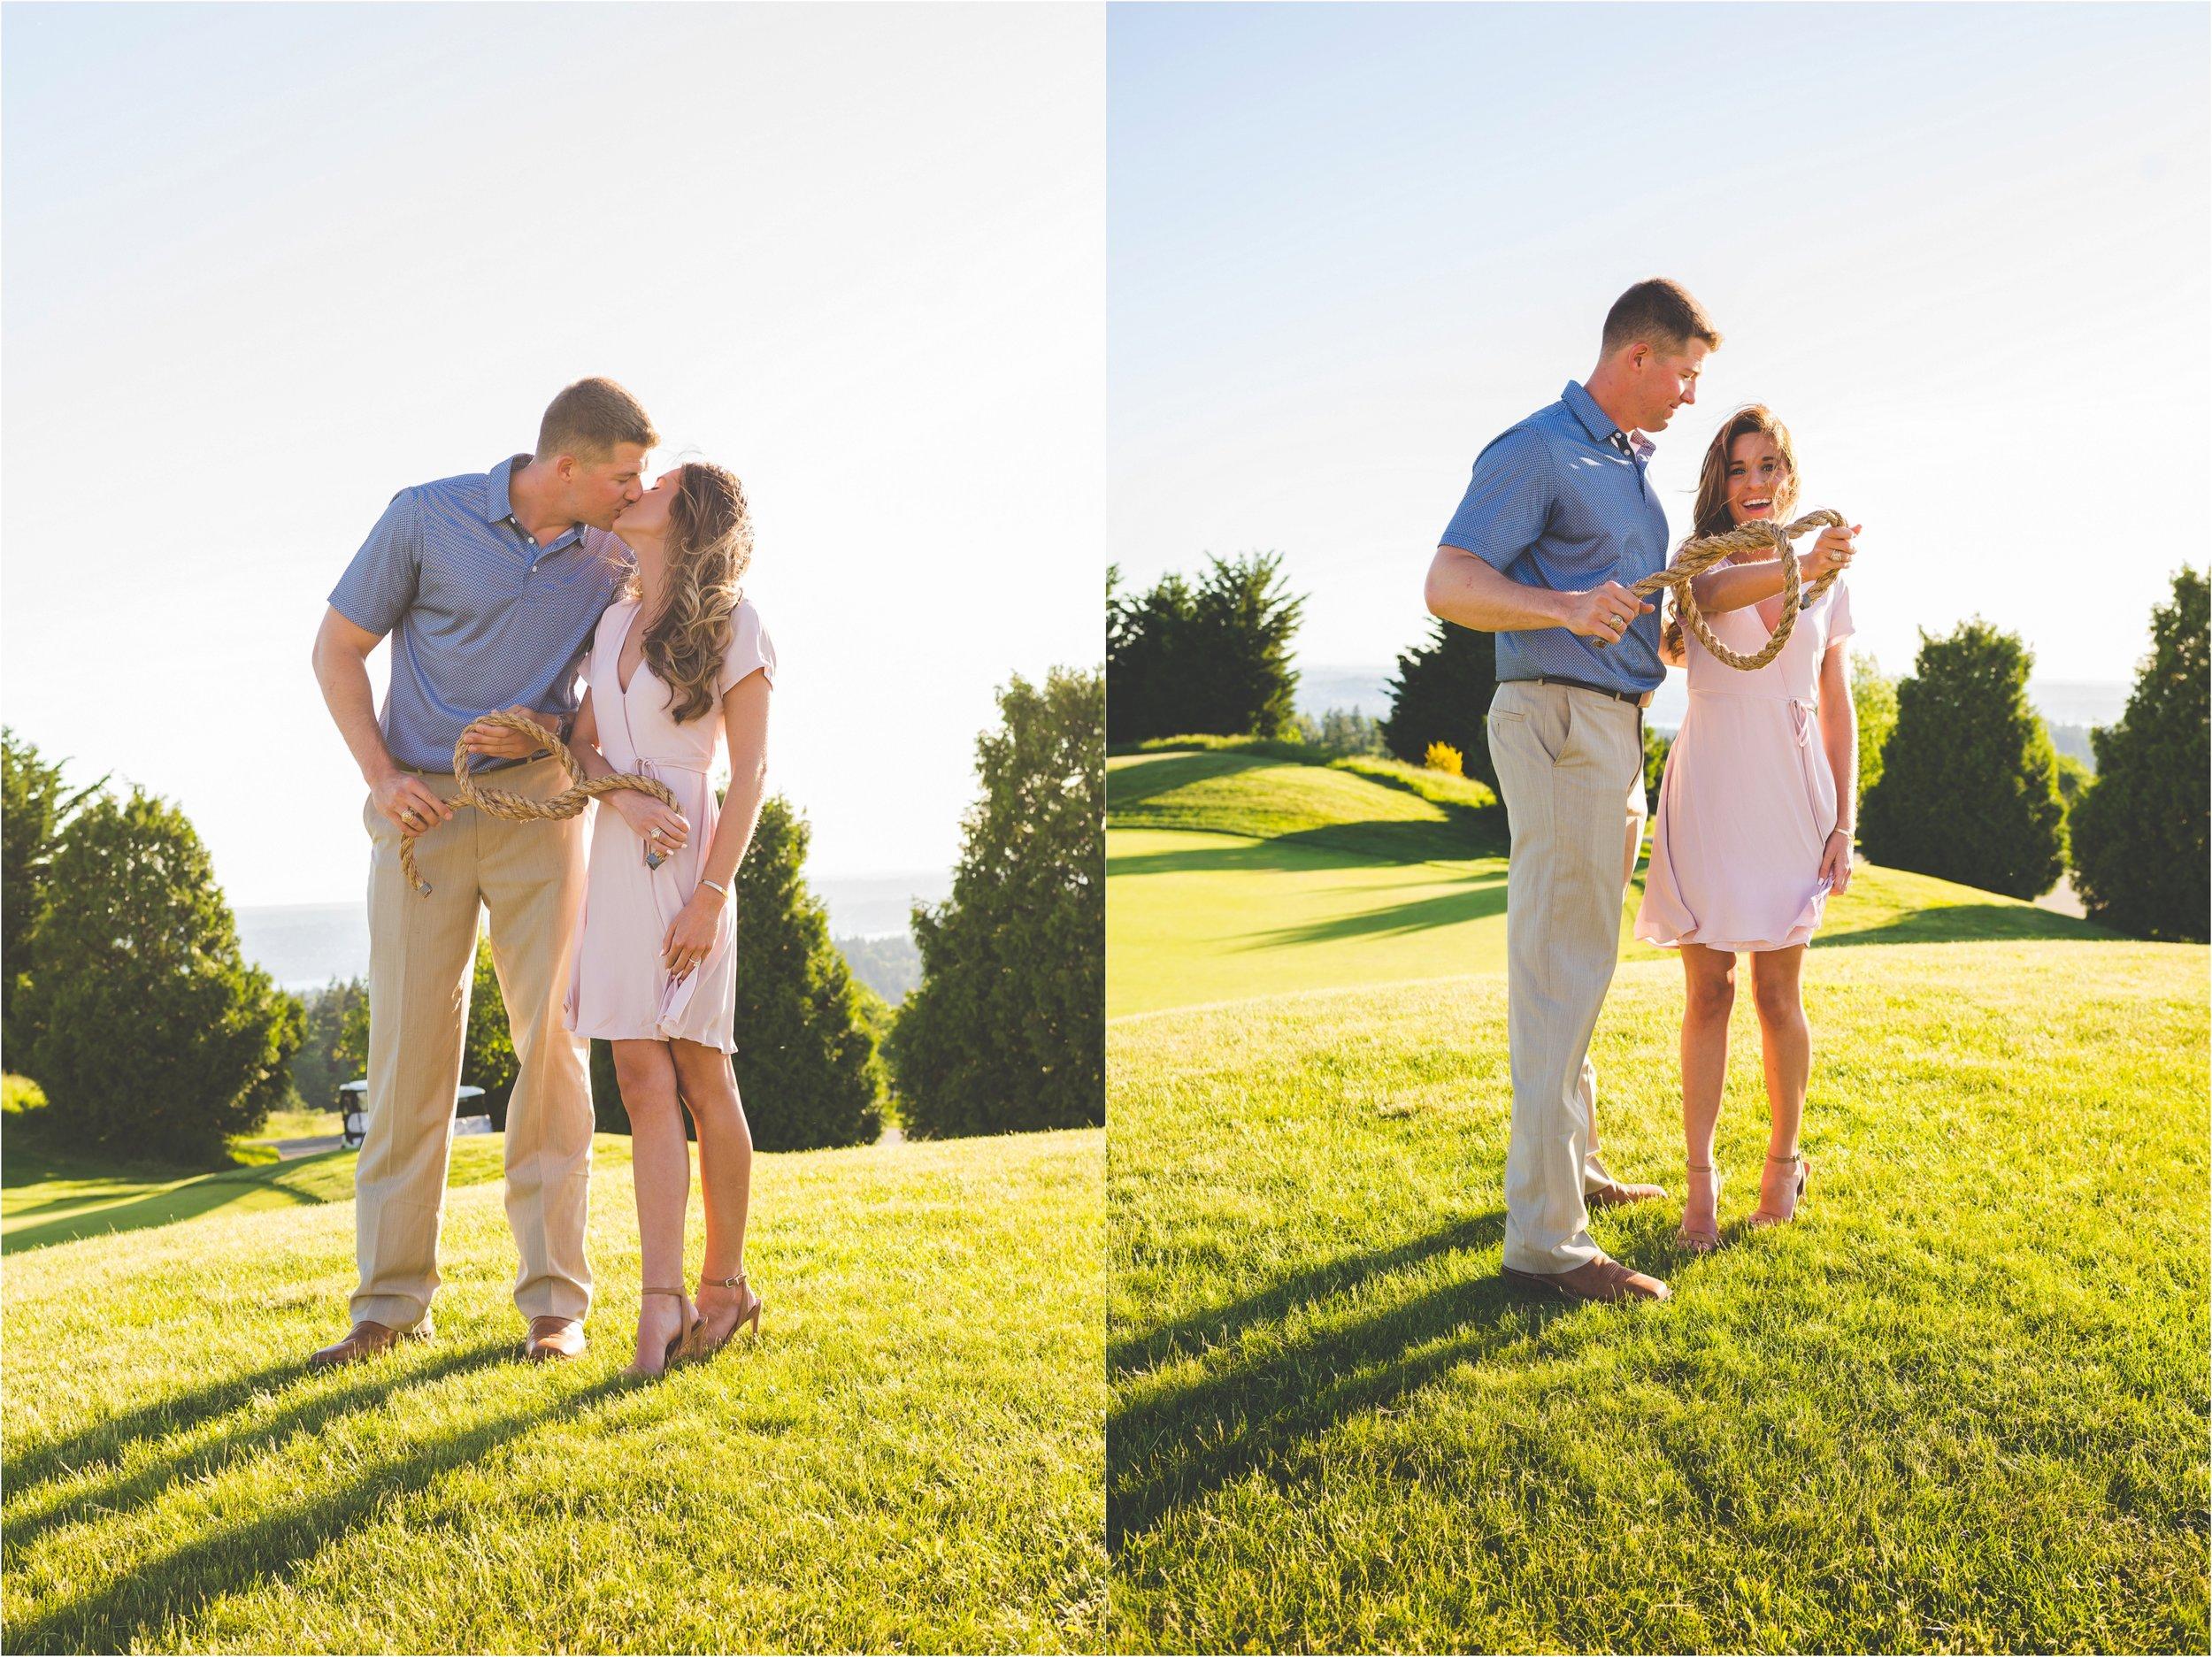 newcastle-golf-club-proposal-jannicka-mayte-seattle-washington-engagement-wedding-photographer_0016.jpg